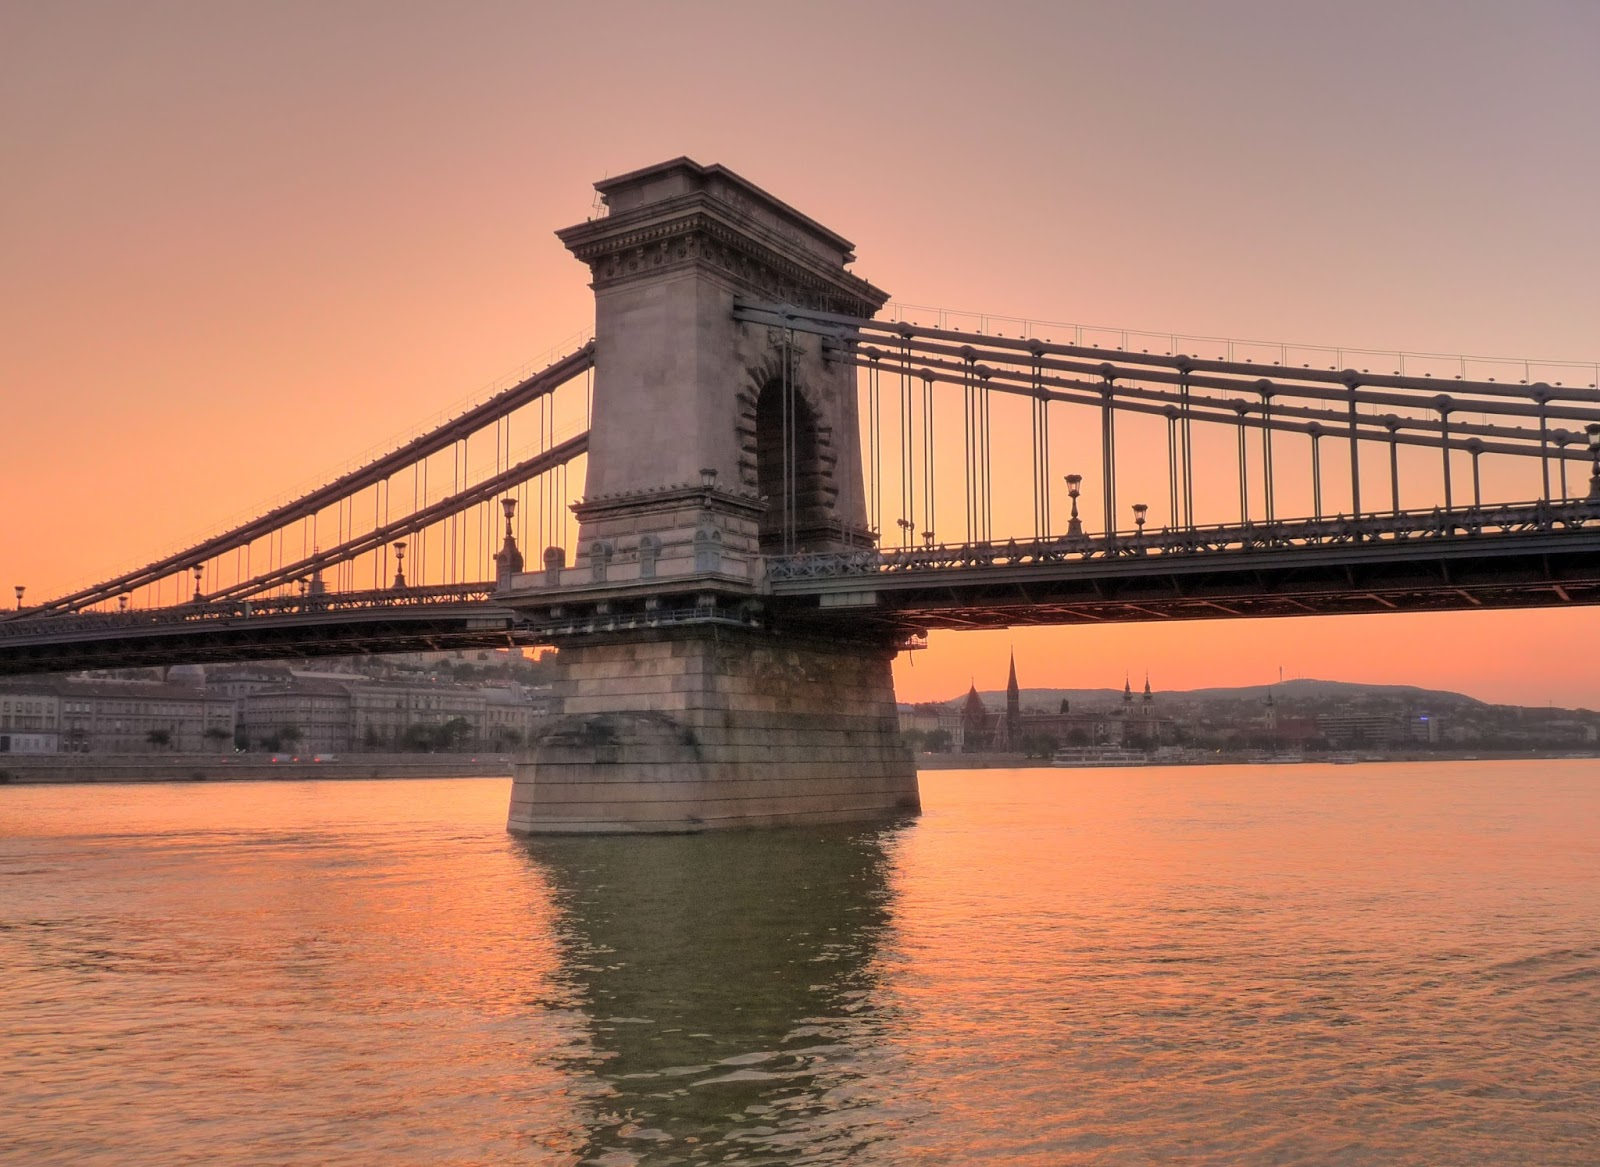 Travel Trip Journey Sz 233 Chenyi Chain Bridge In Budapest